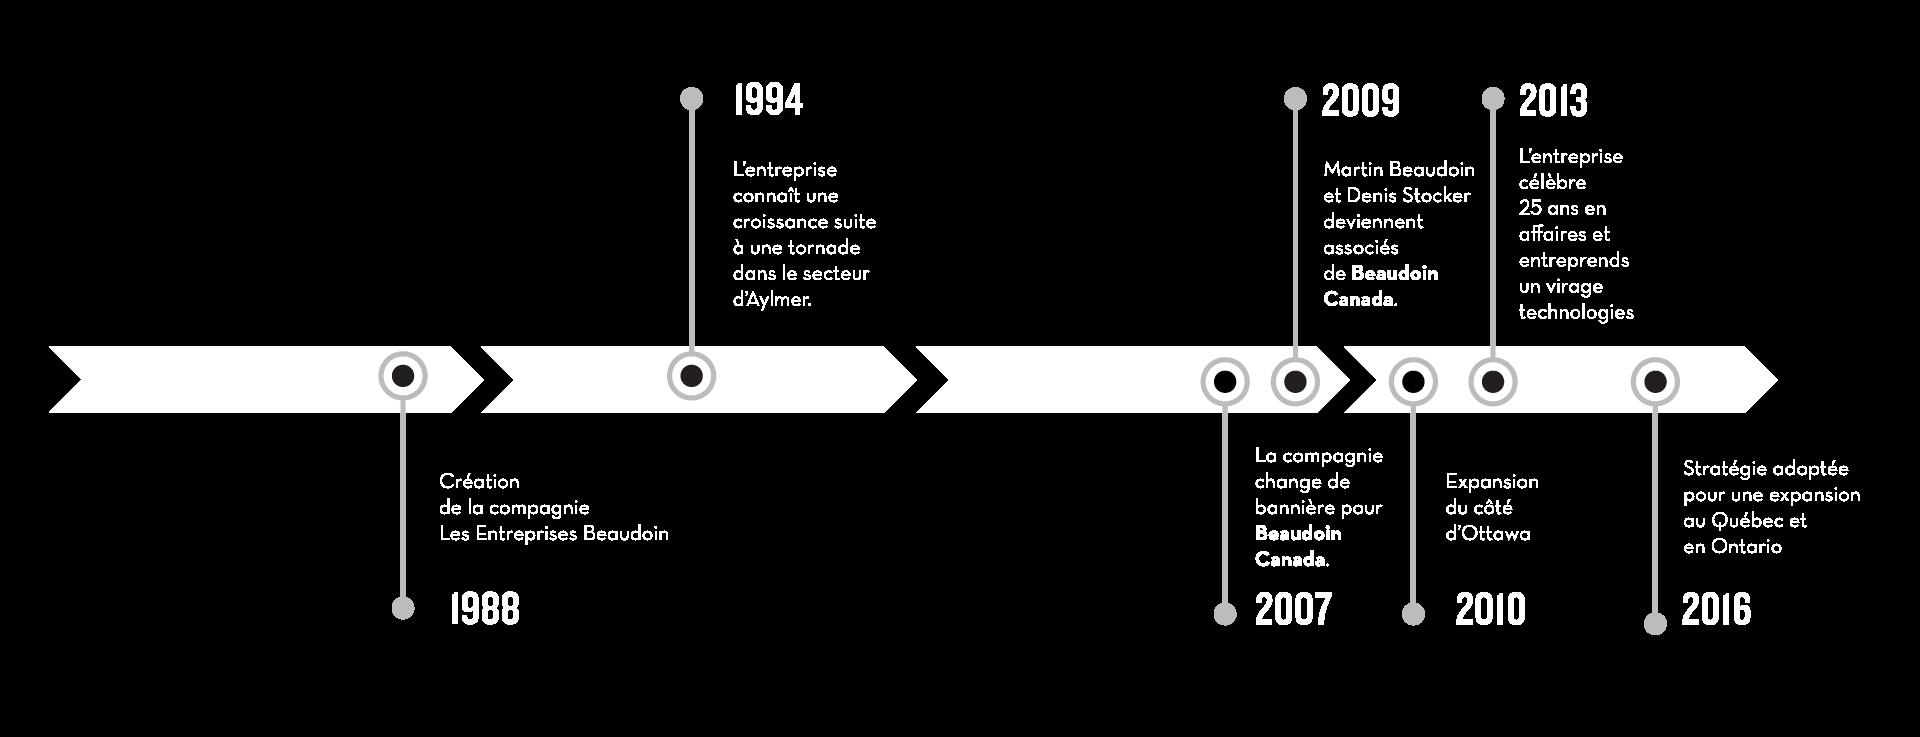 Beaudoin Canada - Ligne de temps